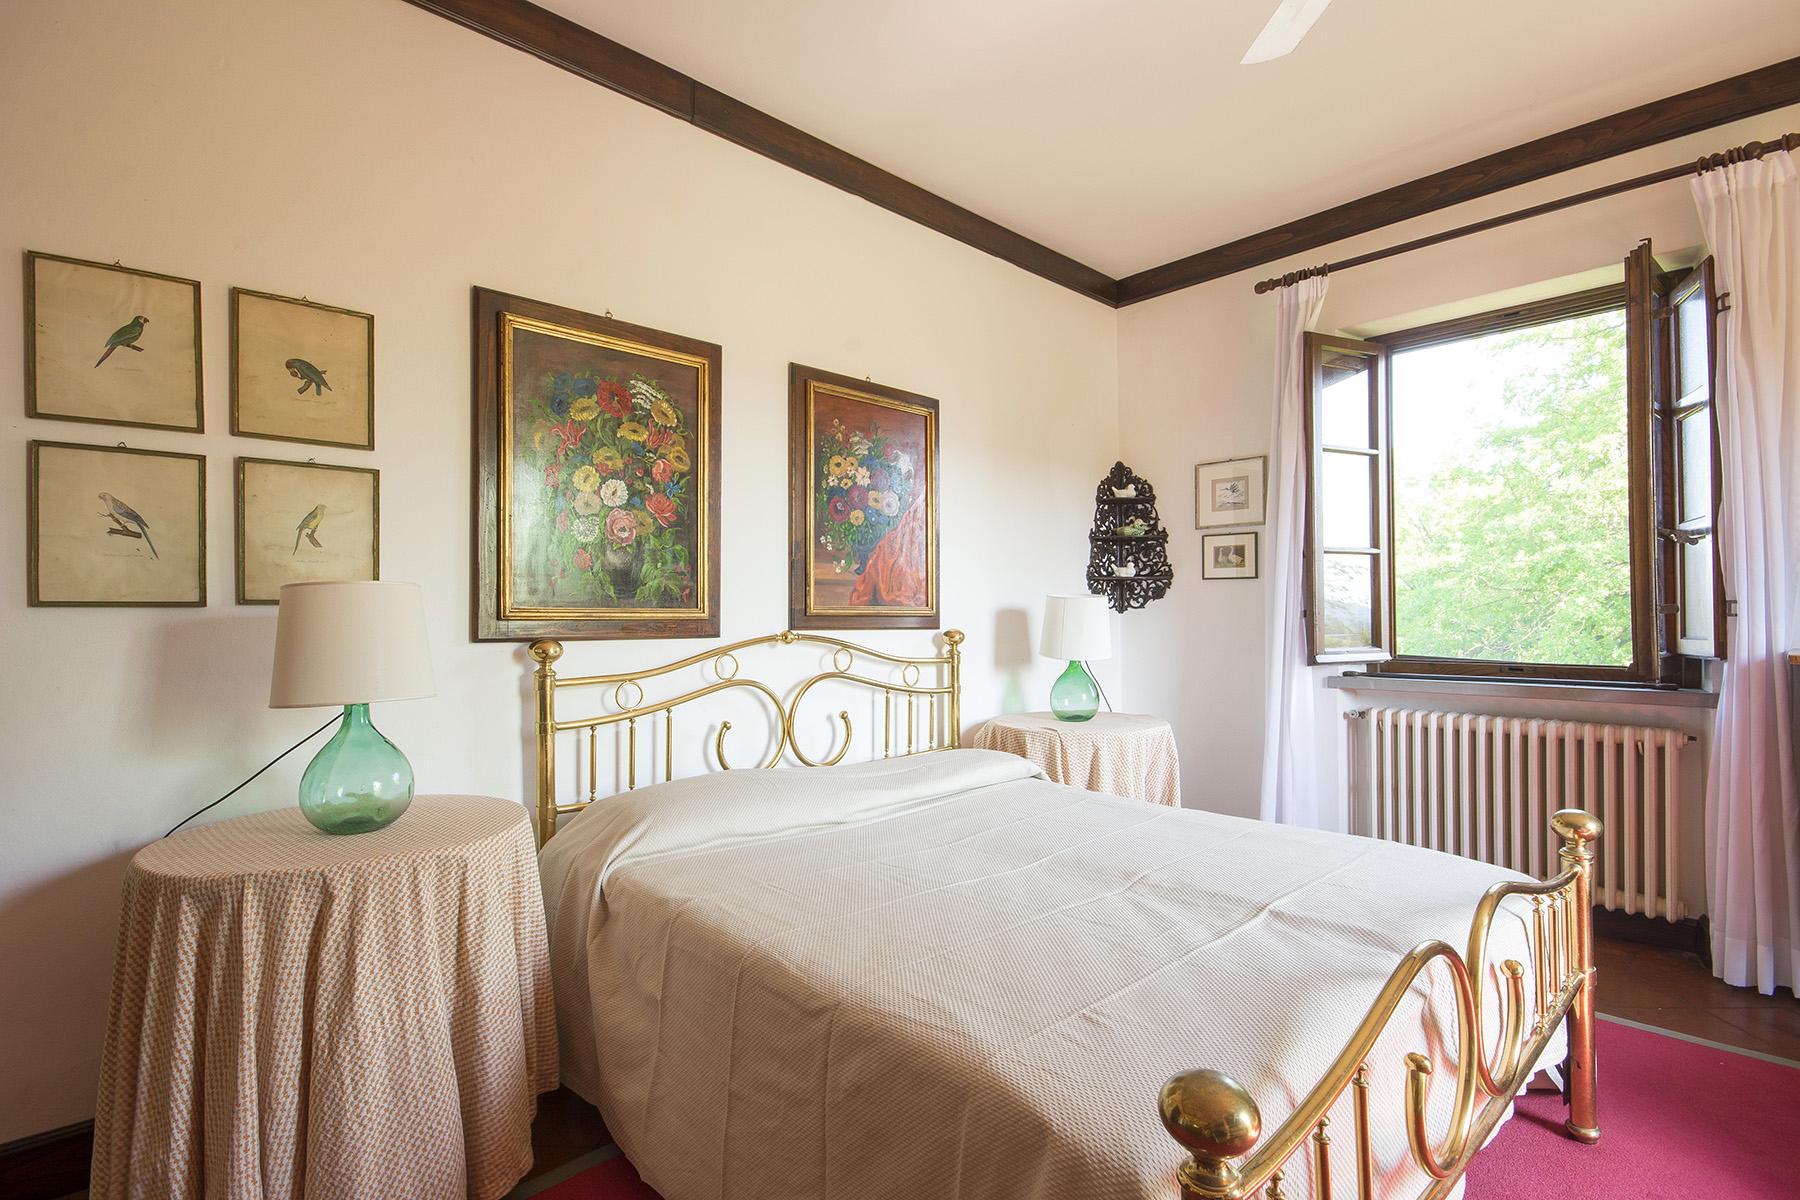 Villa in Vendita a Lucca: 5 locali, 600 mq - Foto 21